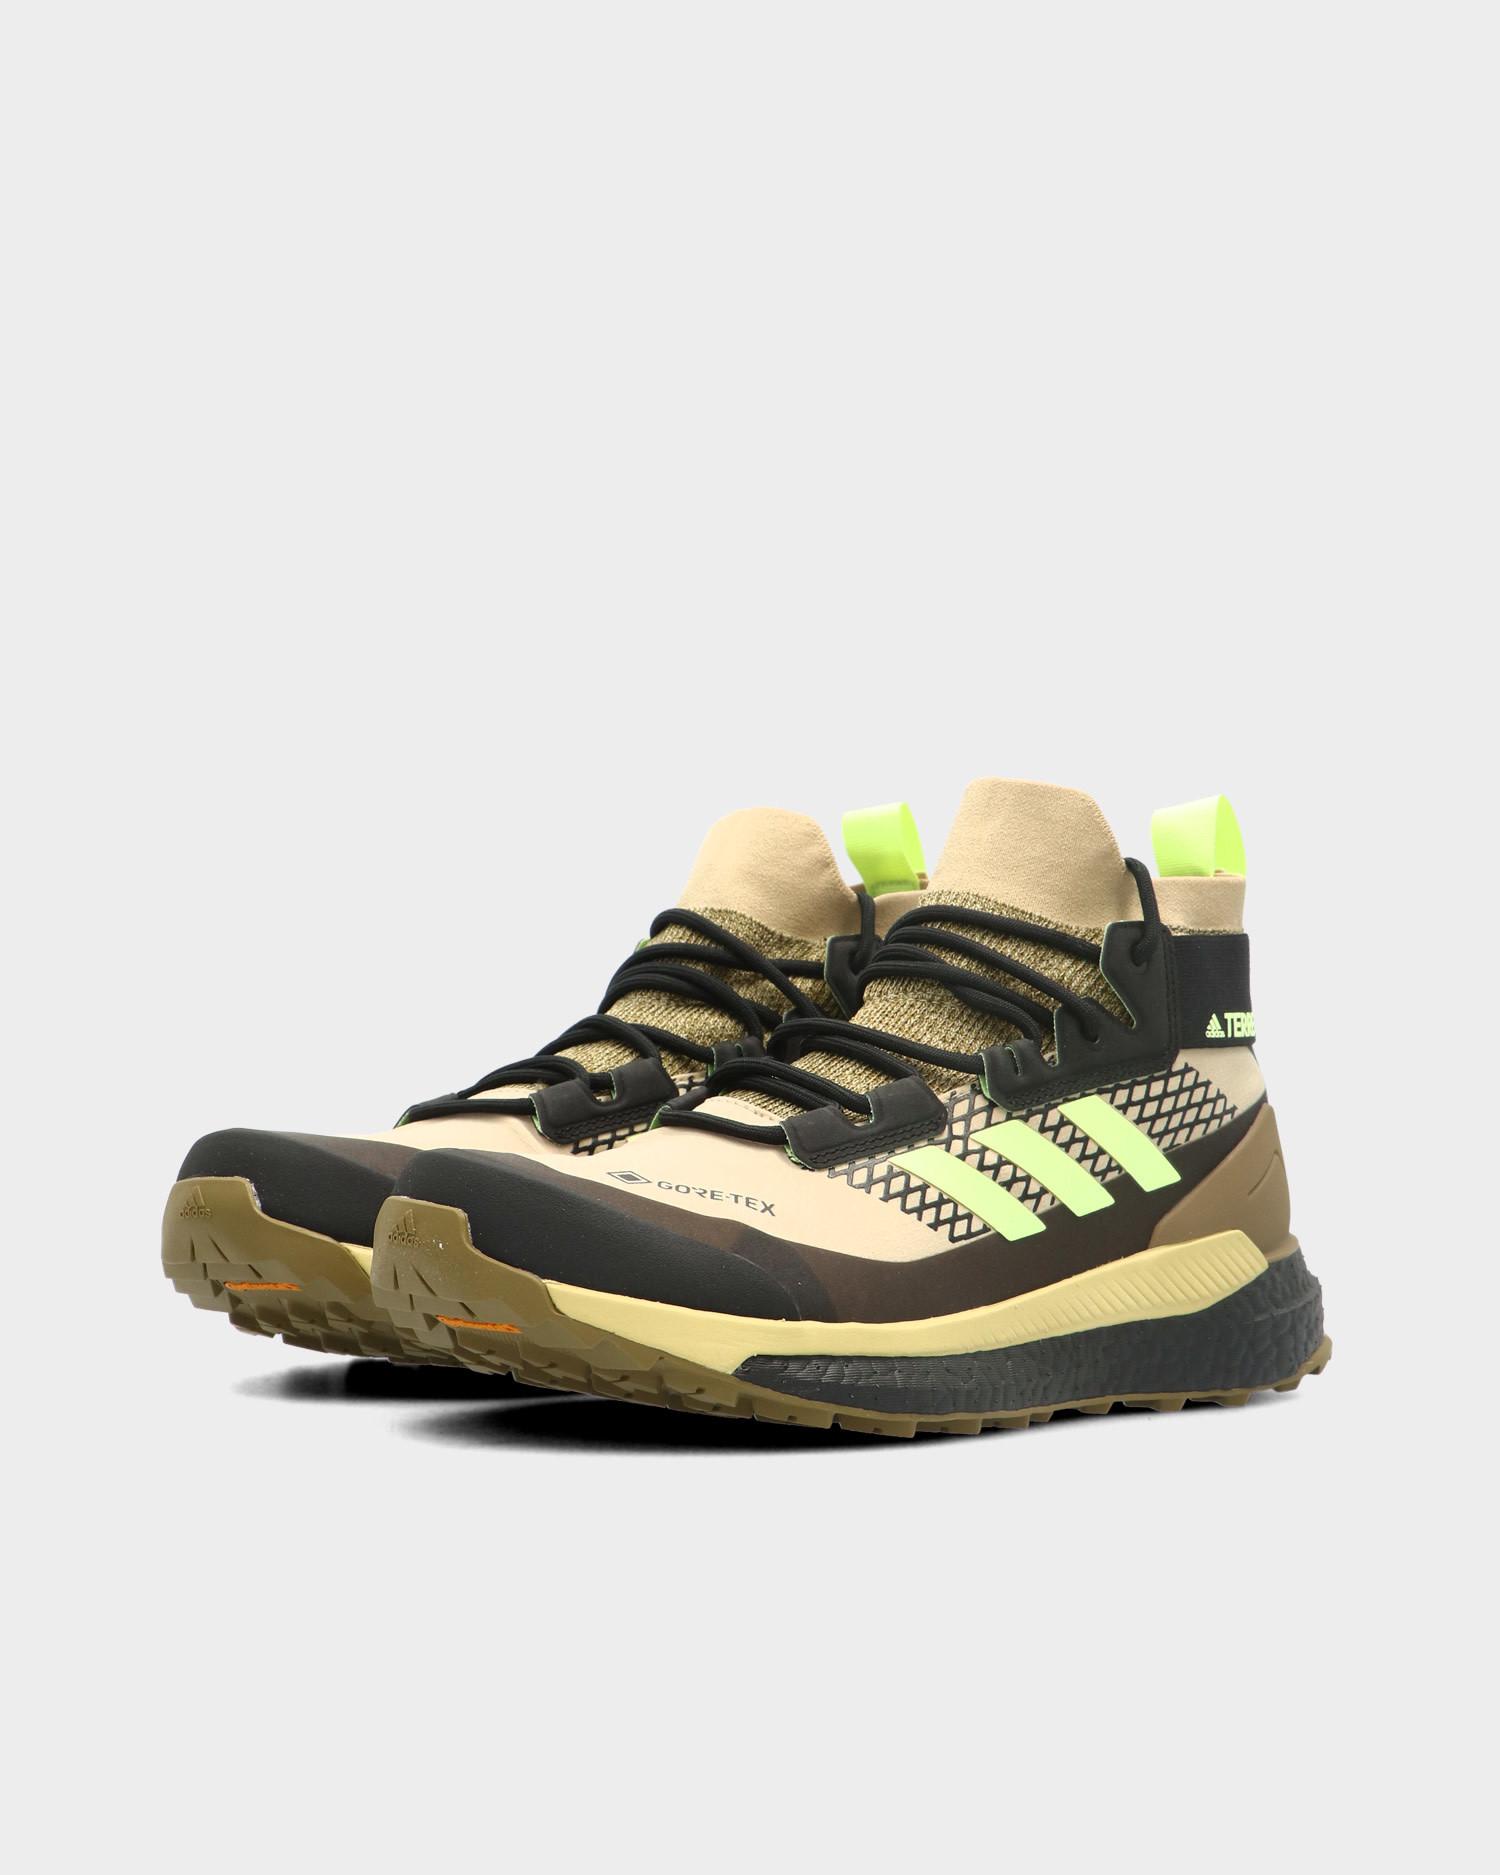 Adidas Terrex Free Hiker G Savanne/Hireye/Cblack